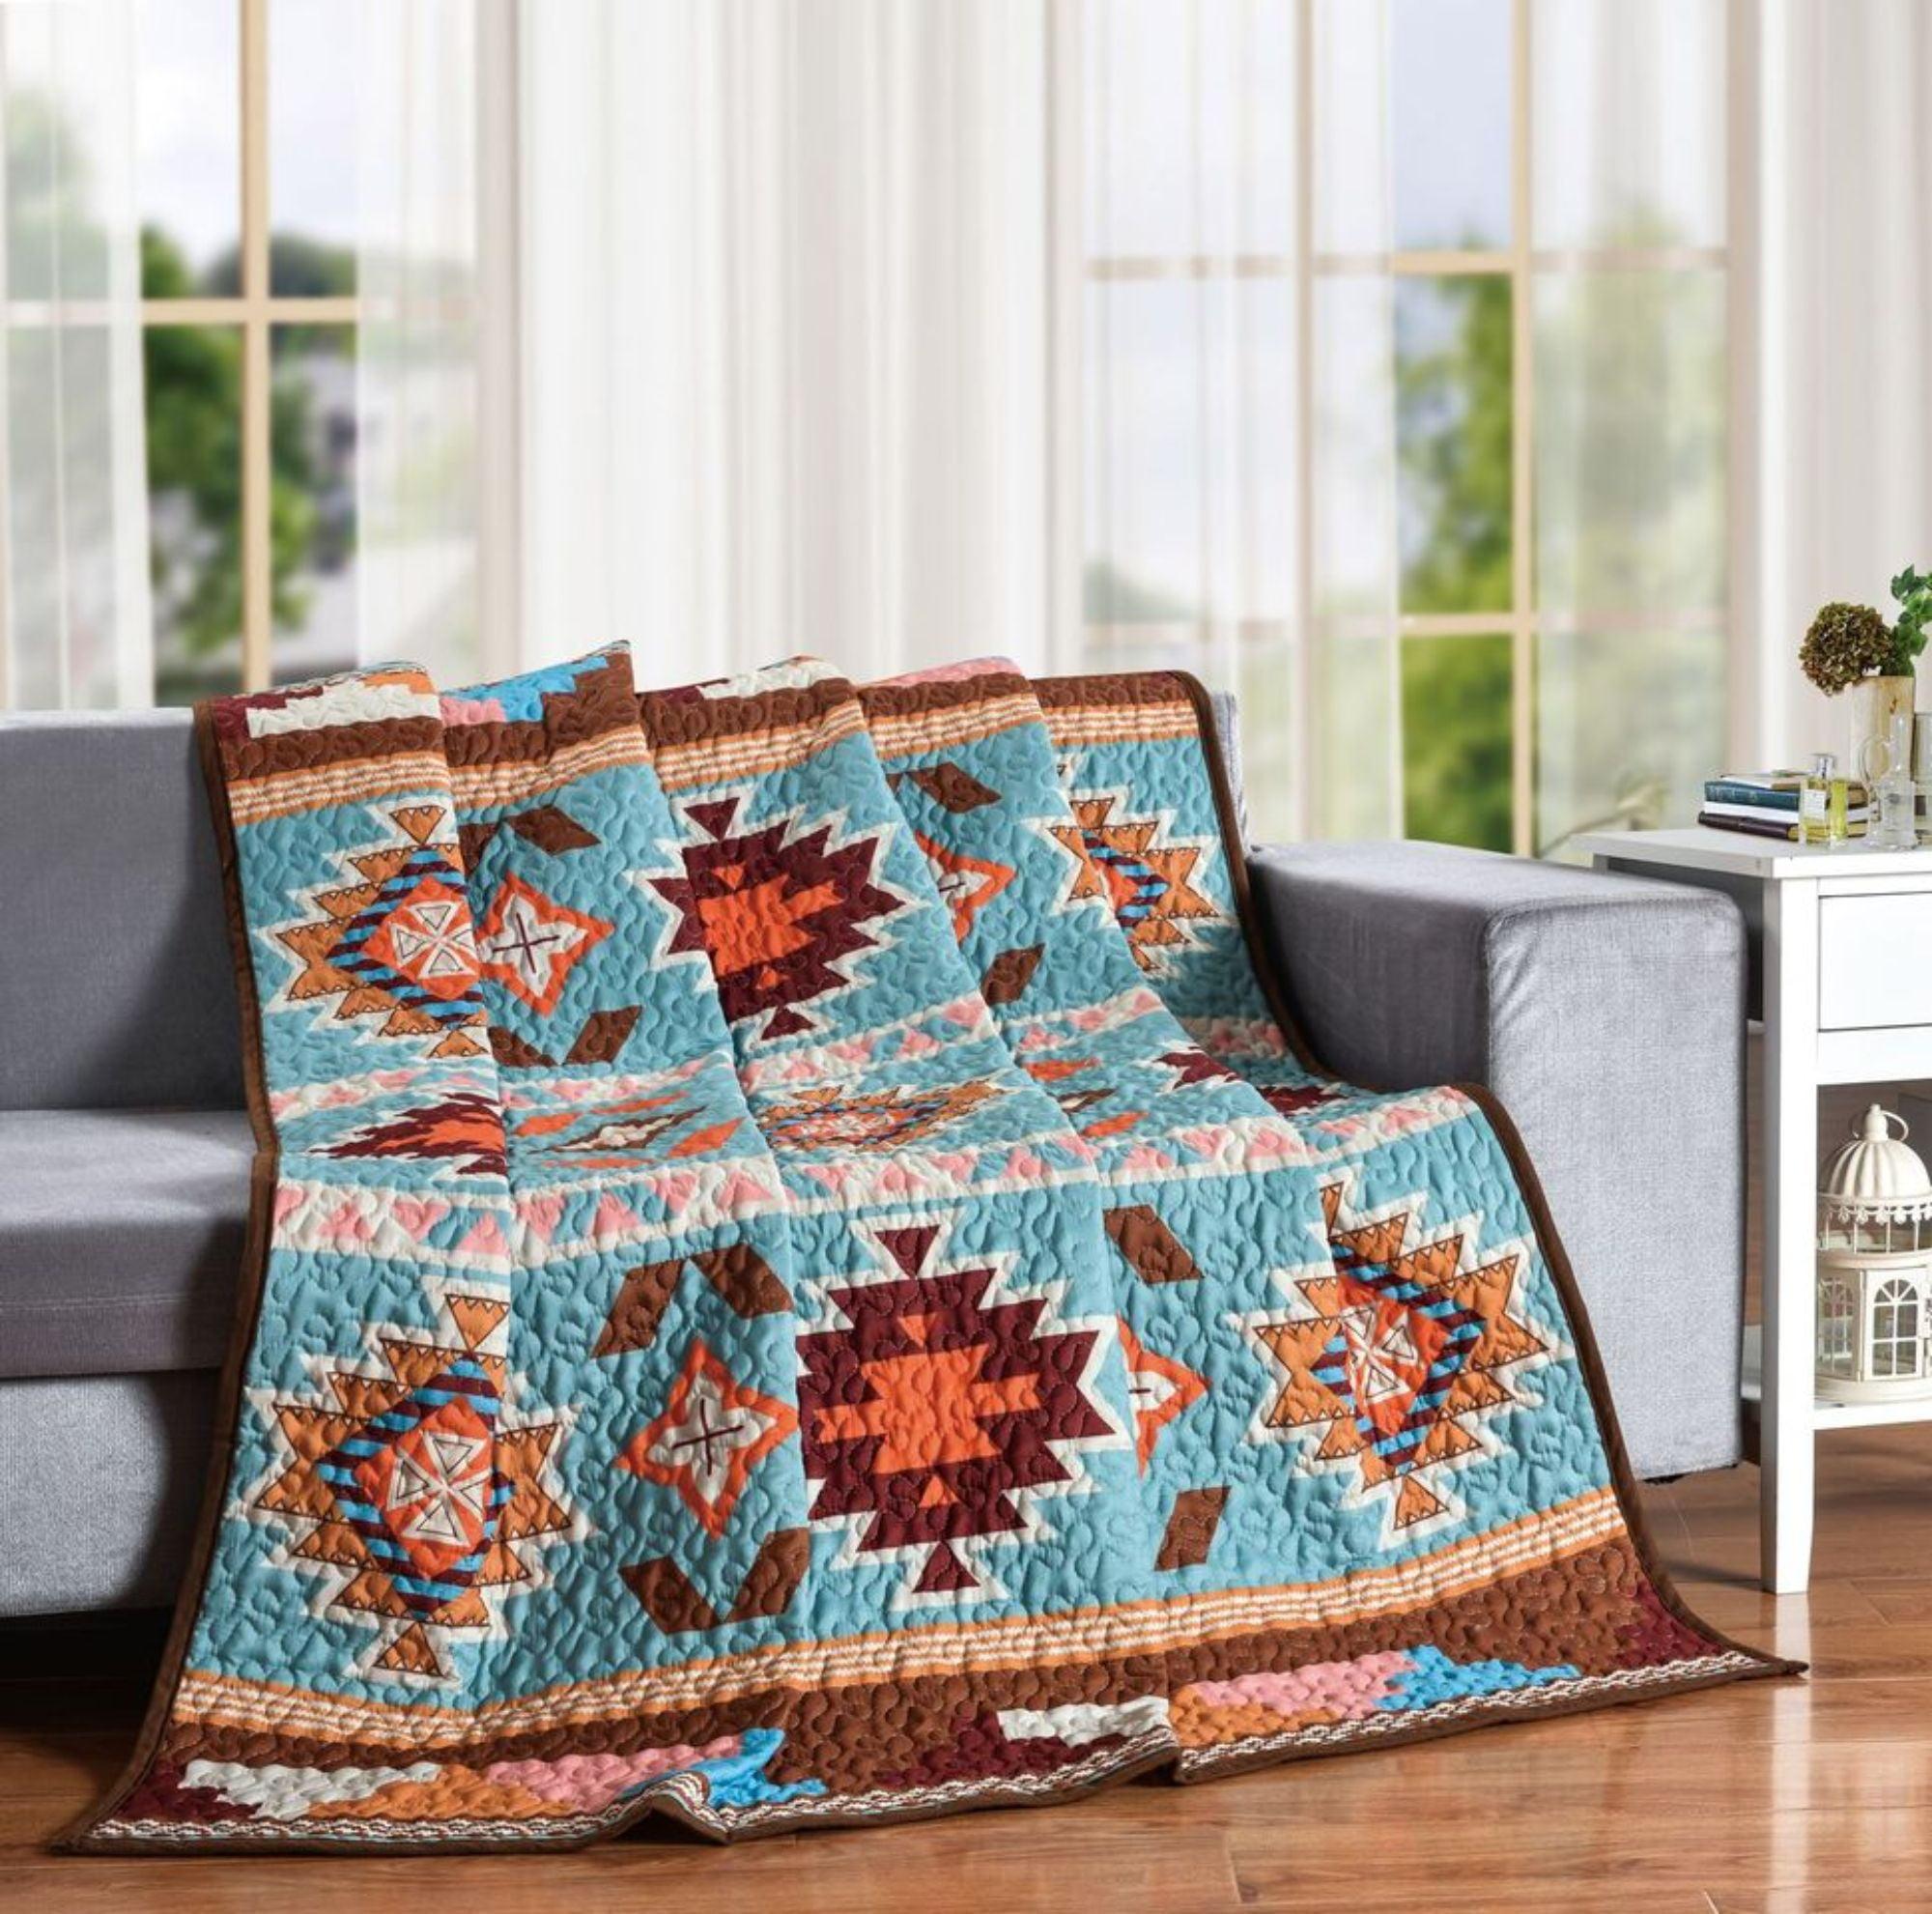 White And Orange Southwestern Boho Beauty Decorative Accent Throw Blanket 60 X 50 Walmart Com Walmart Com